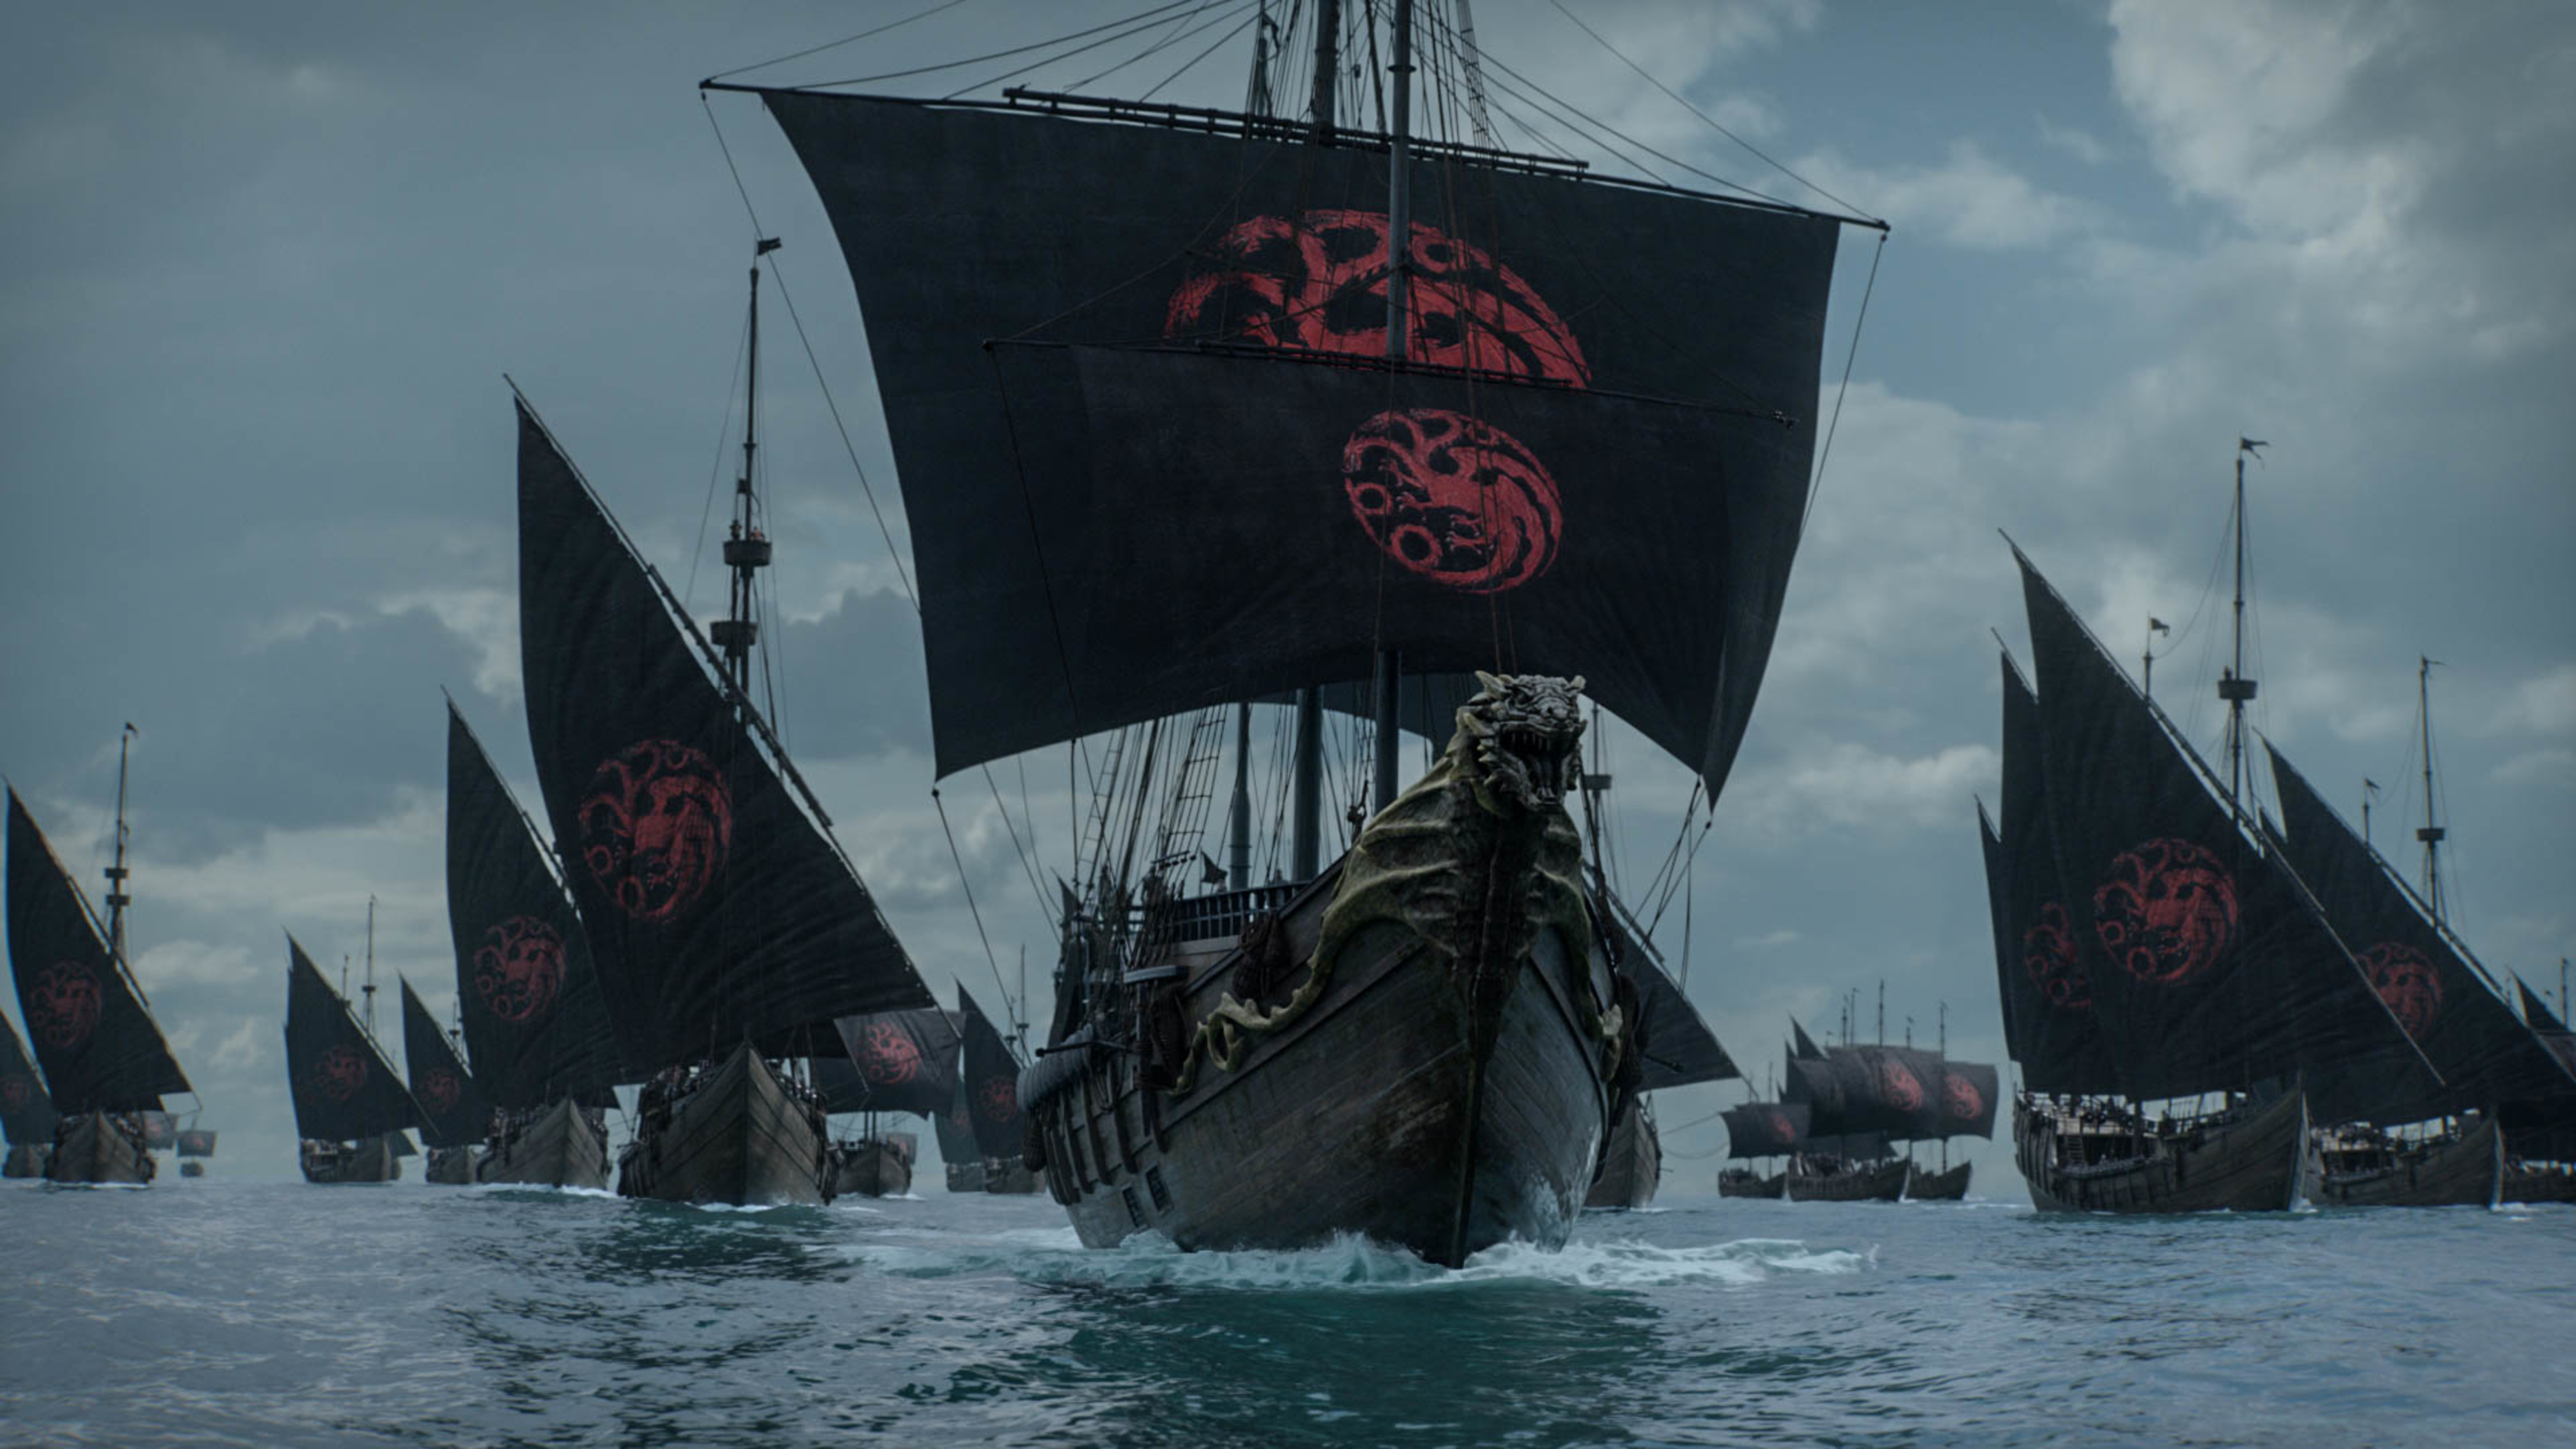 Game of Thrones: Spinoff 10,000 Ships contrata roteirista